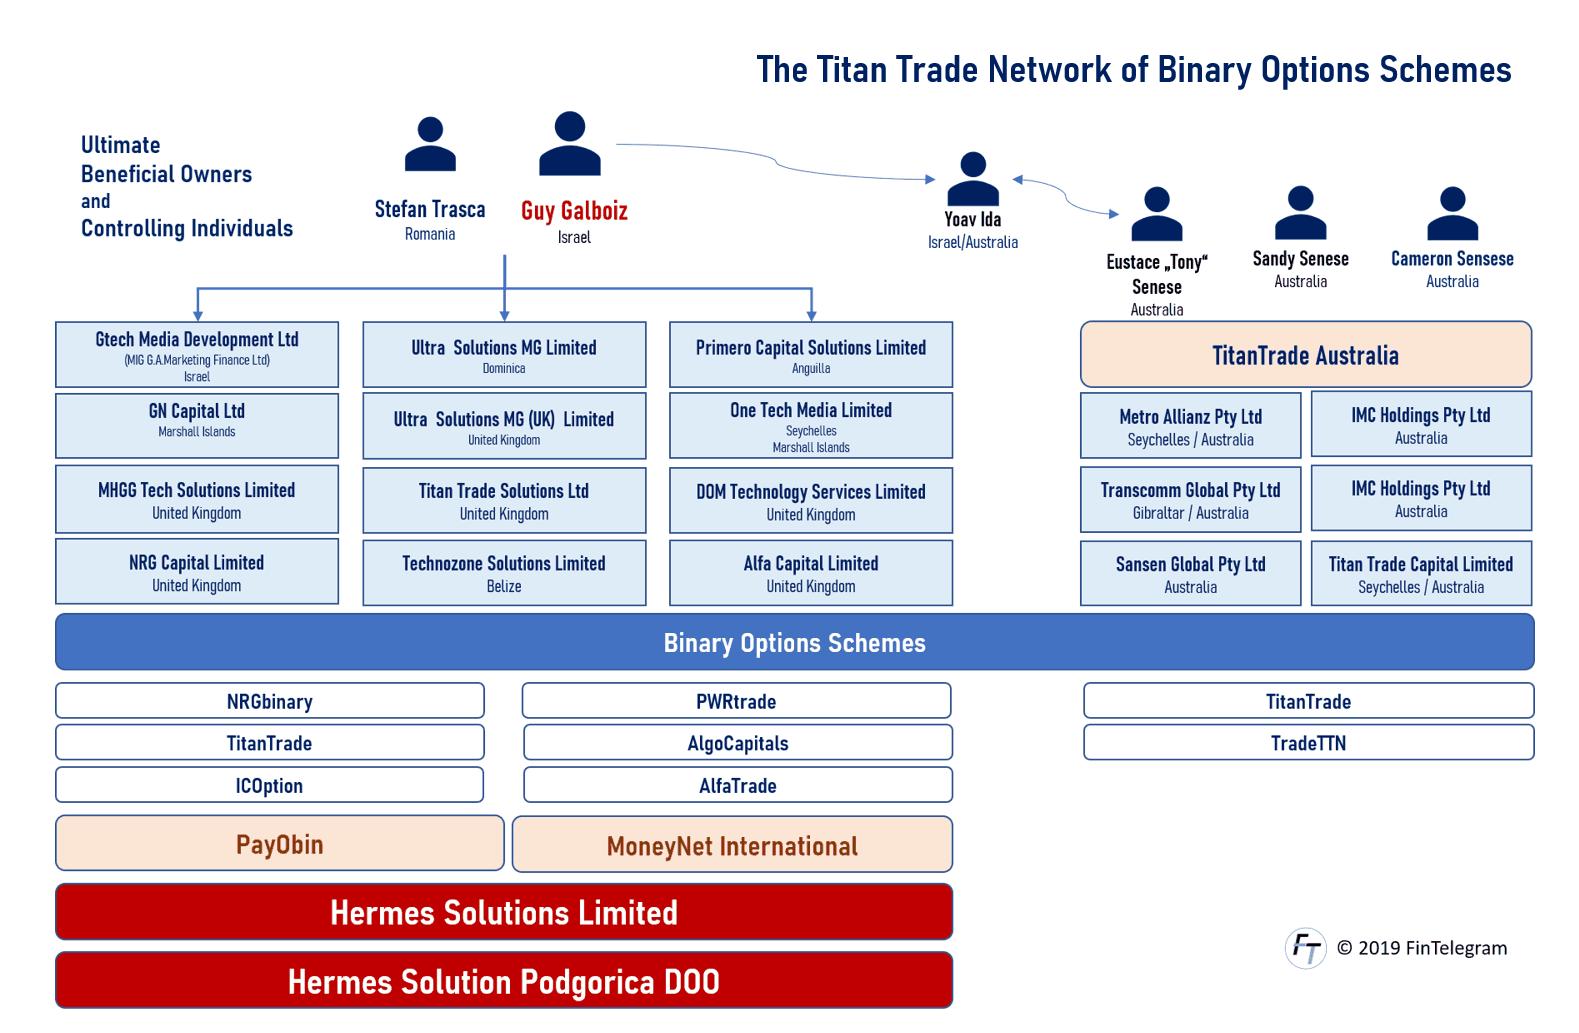 TitanTrade Network of binary options scheme